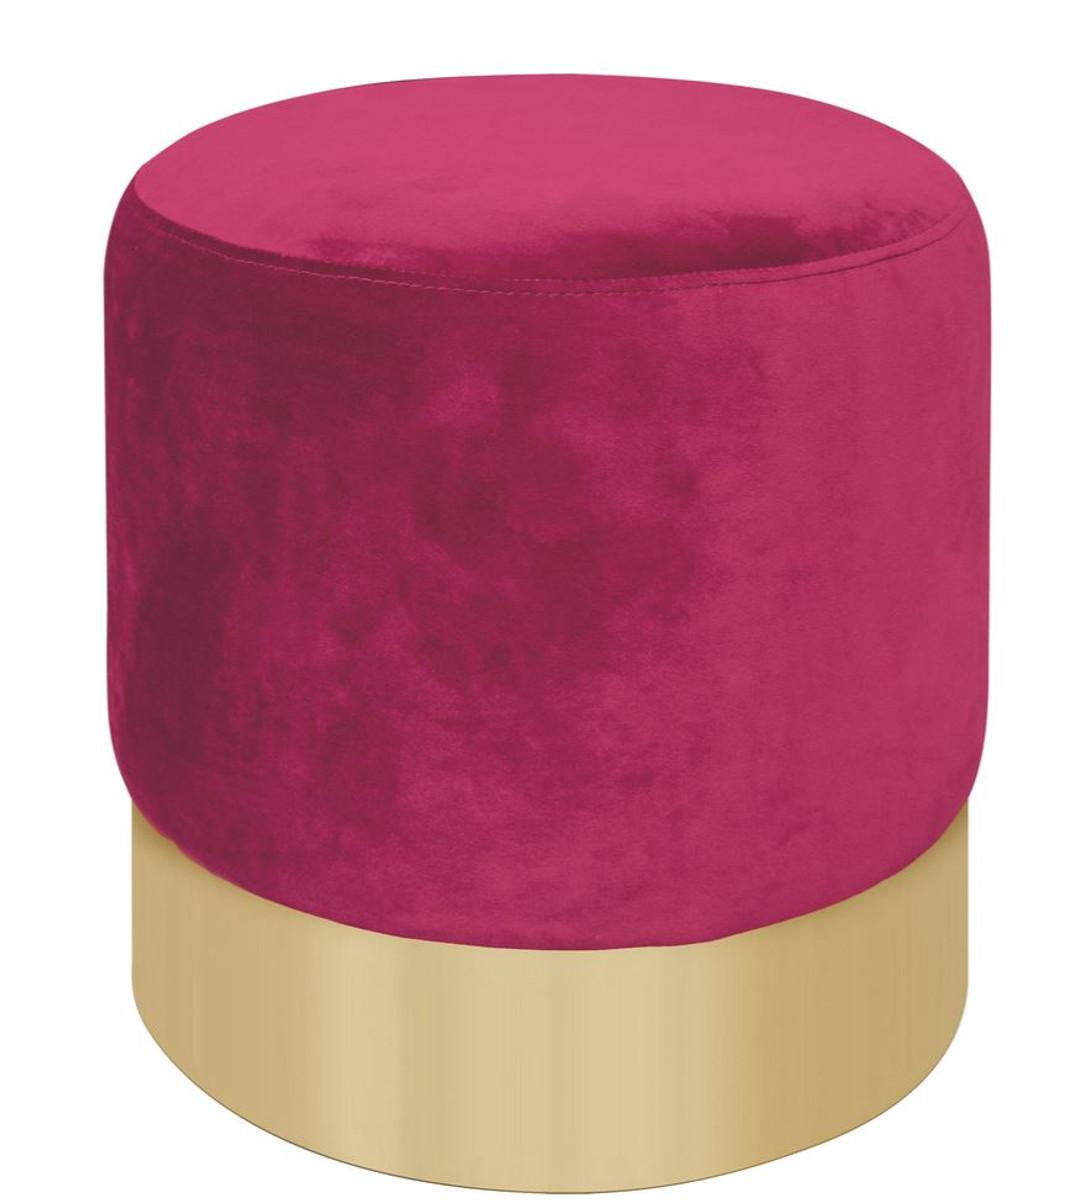 casa padrino hocker sitzhocker 46 x h 48 cm luxus m bel hocker. Black Bedroom Furniture Sets. Home Design Ideas